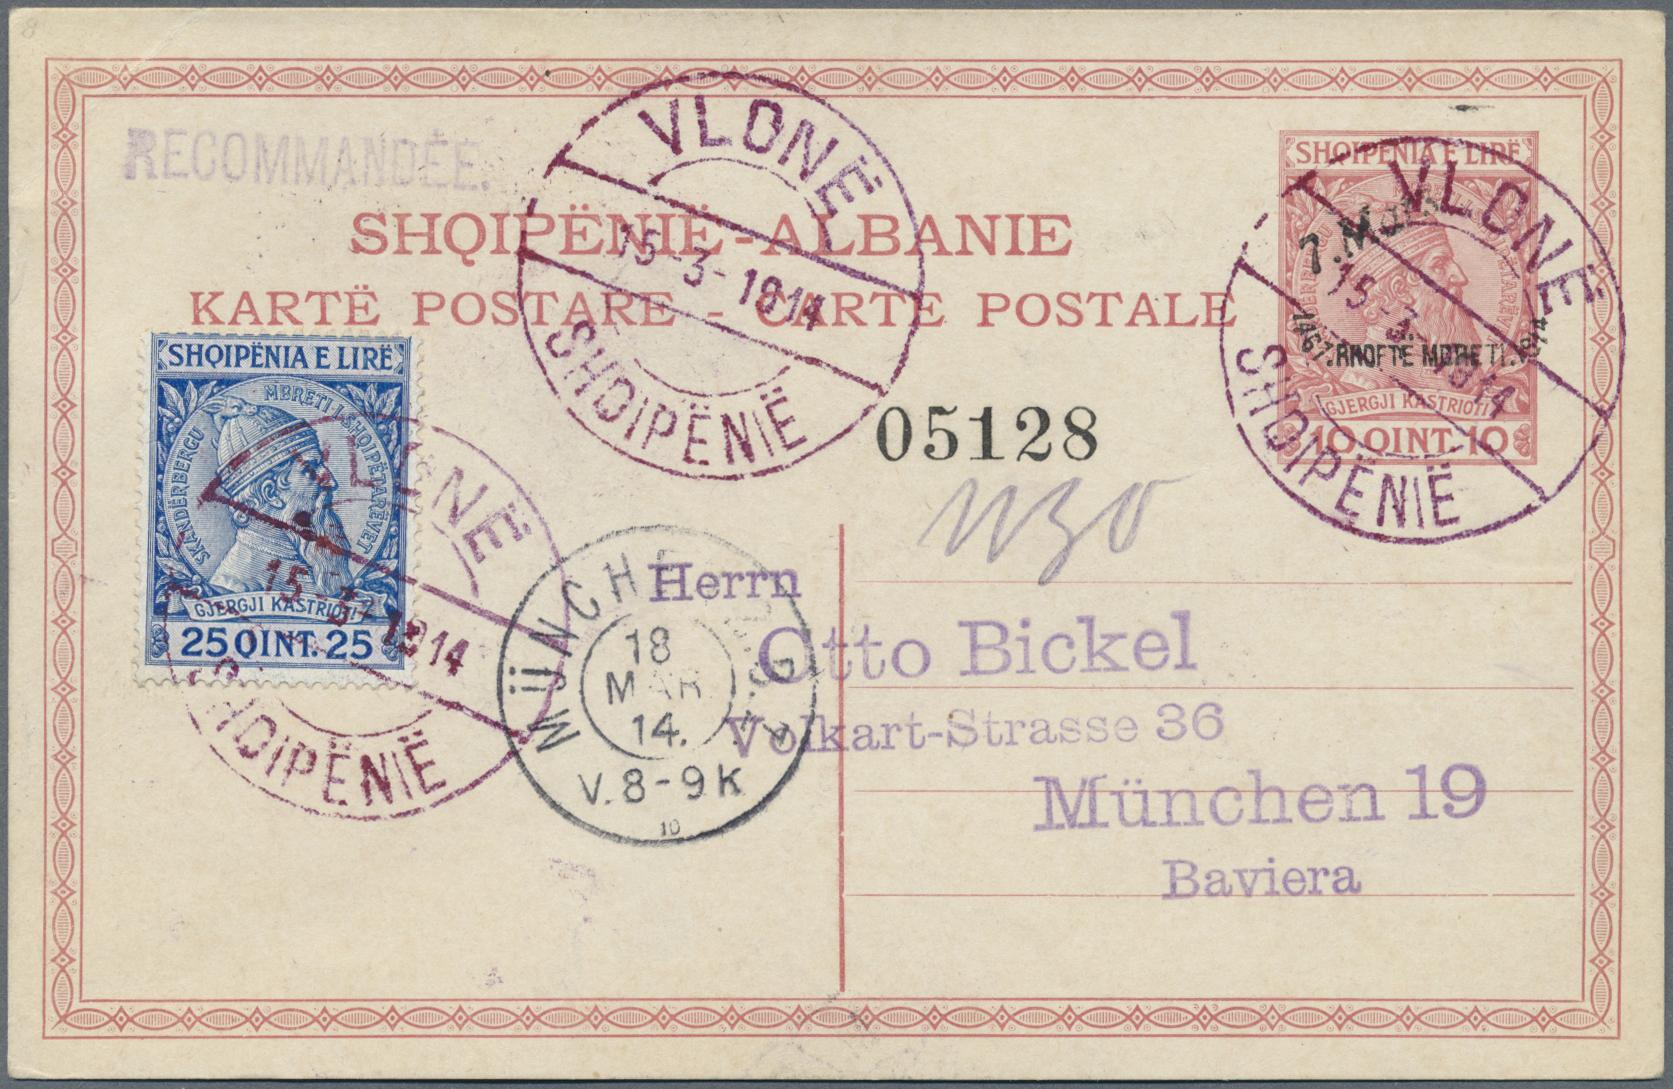 Lot 15564 - Albanien - Ganzsachen  -  Auktionshaus Christoph Gärtner GmbH & Co. KG Single lots Philately Overseas & Europe. Auction #39 Day 4